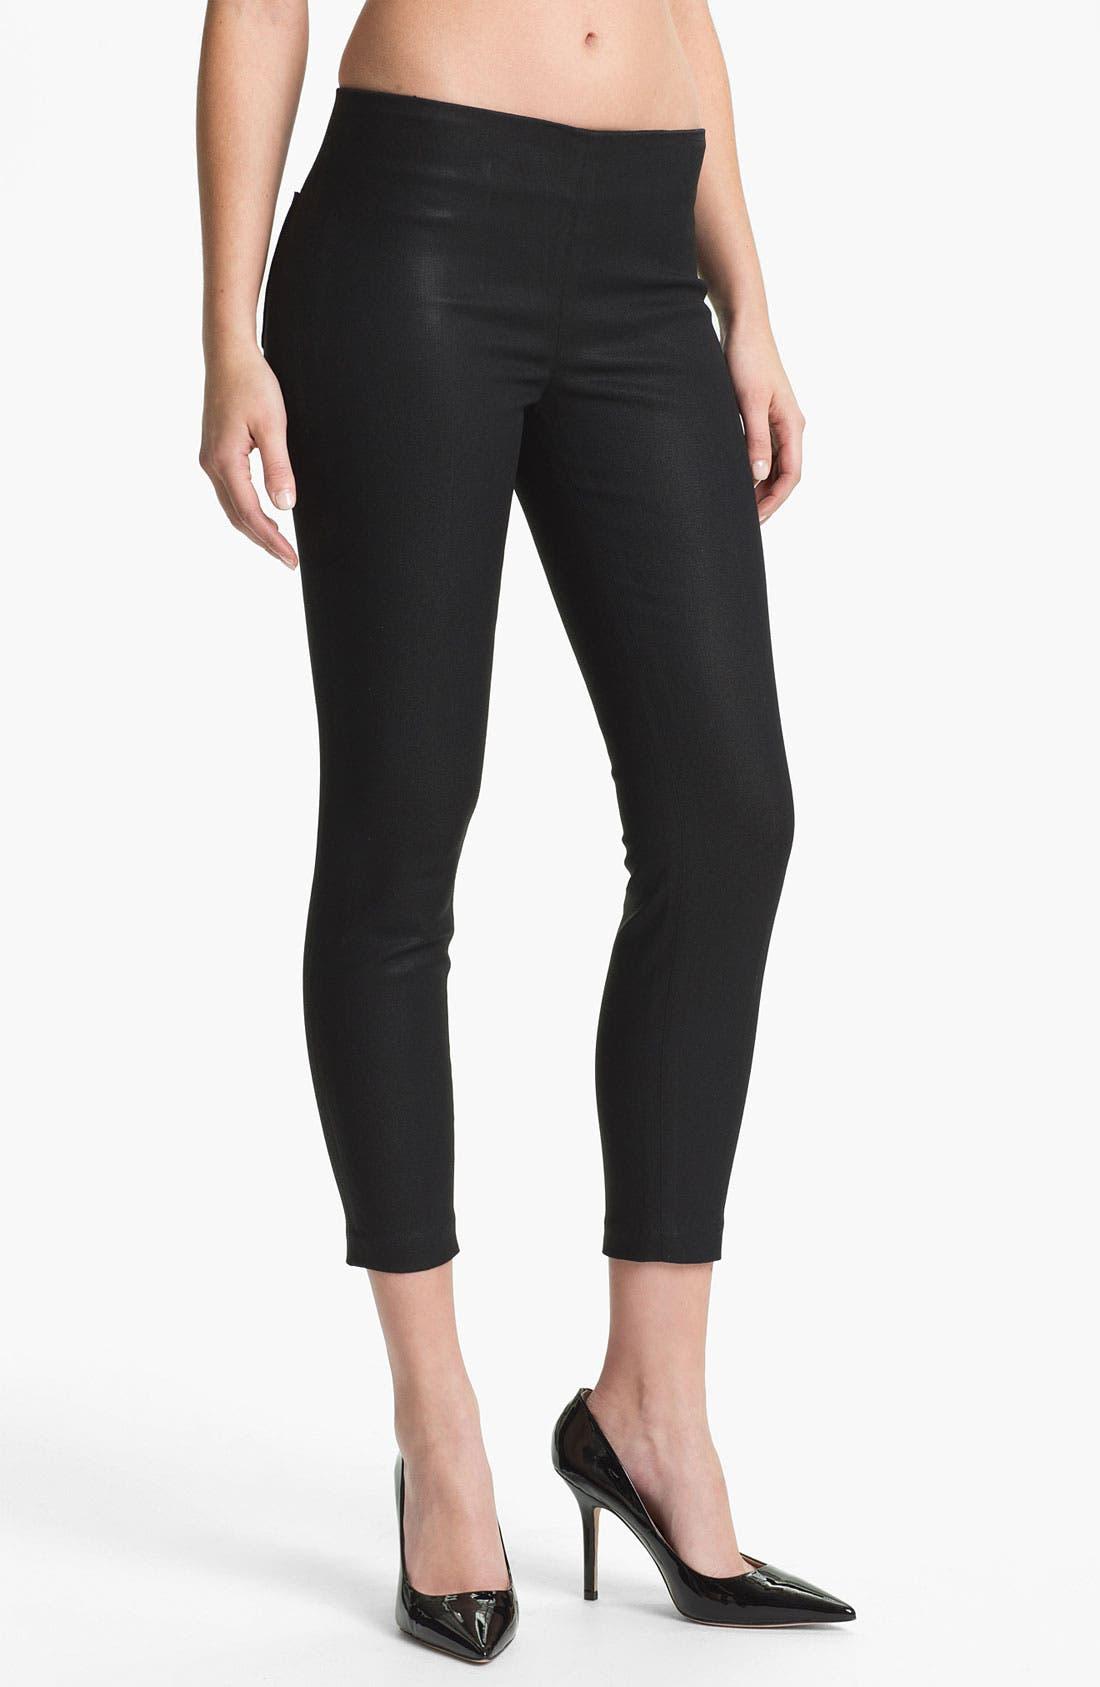 Main Image - J Brand Stretch Capri Leggings (Coated Black)